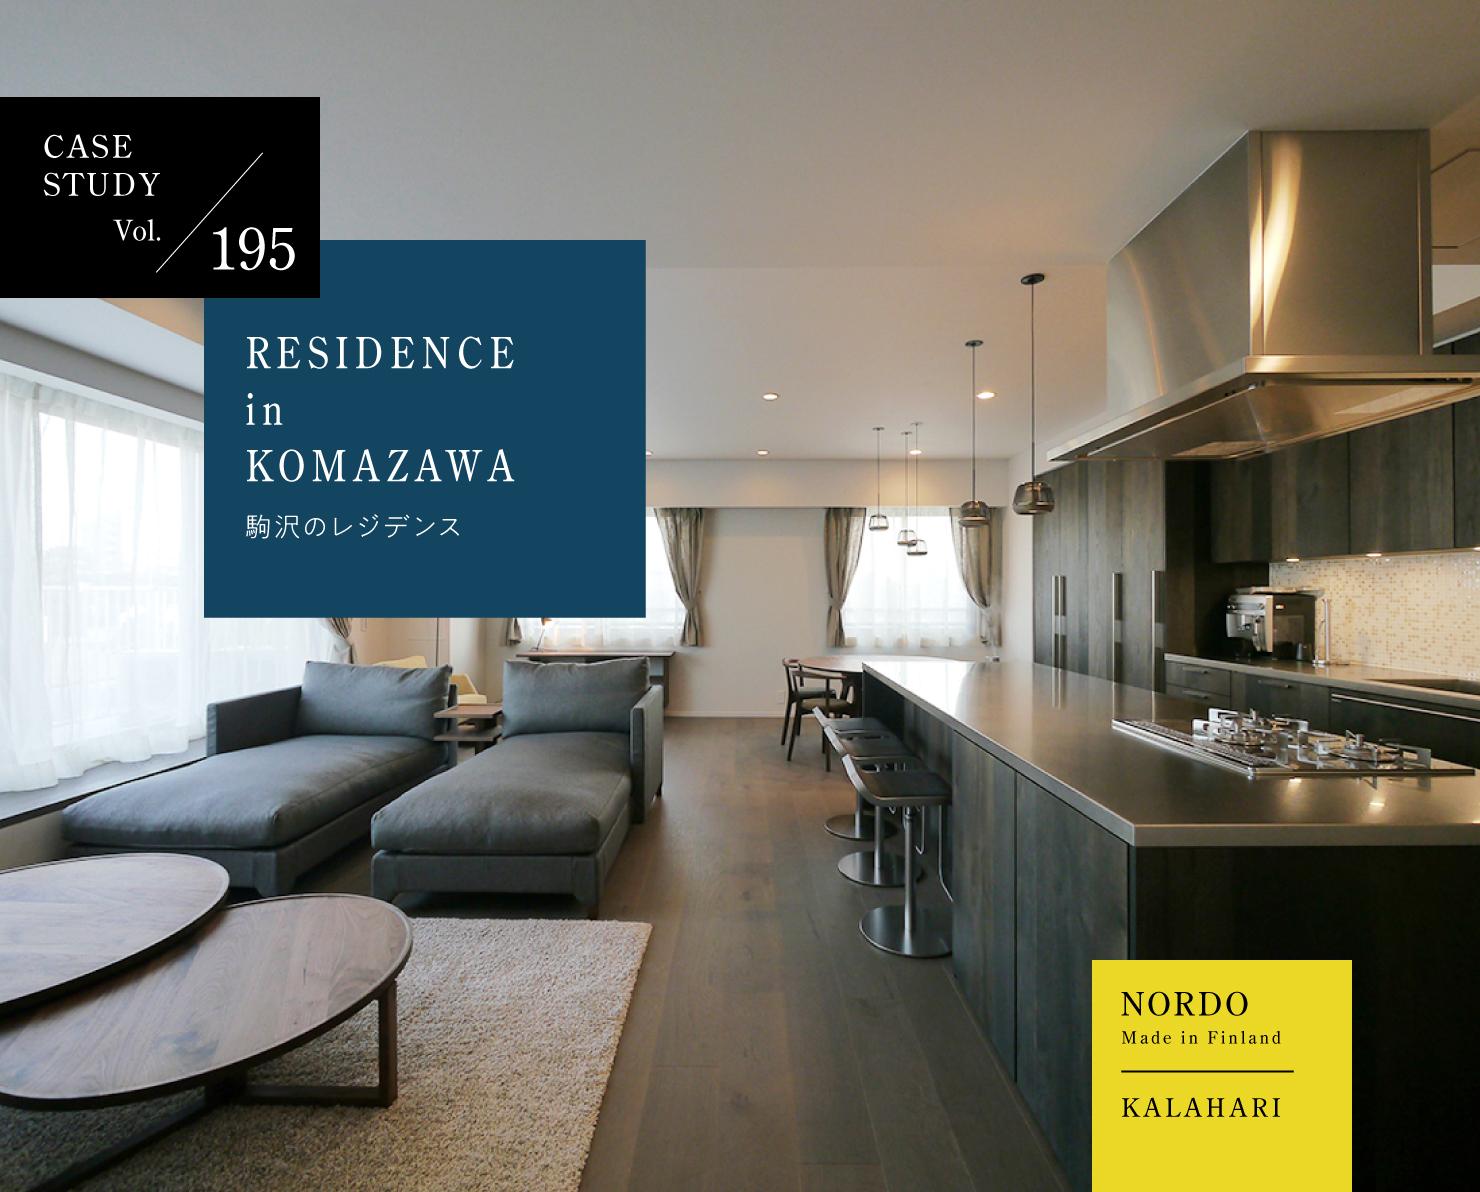 CASE STUDY Vol.195 RESIDENCE in HIGASHIGAOKA 駒沢のレジデンス NORDO KALAHARI